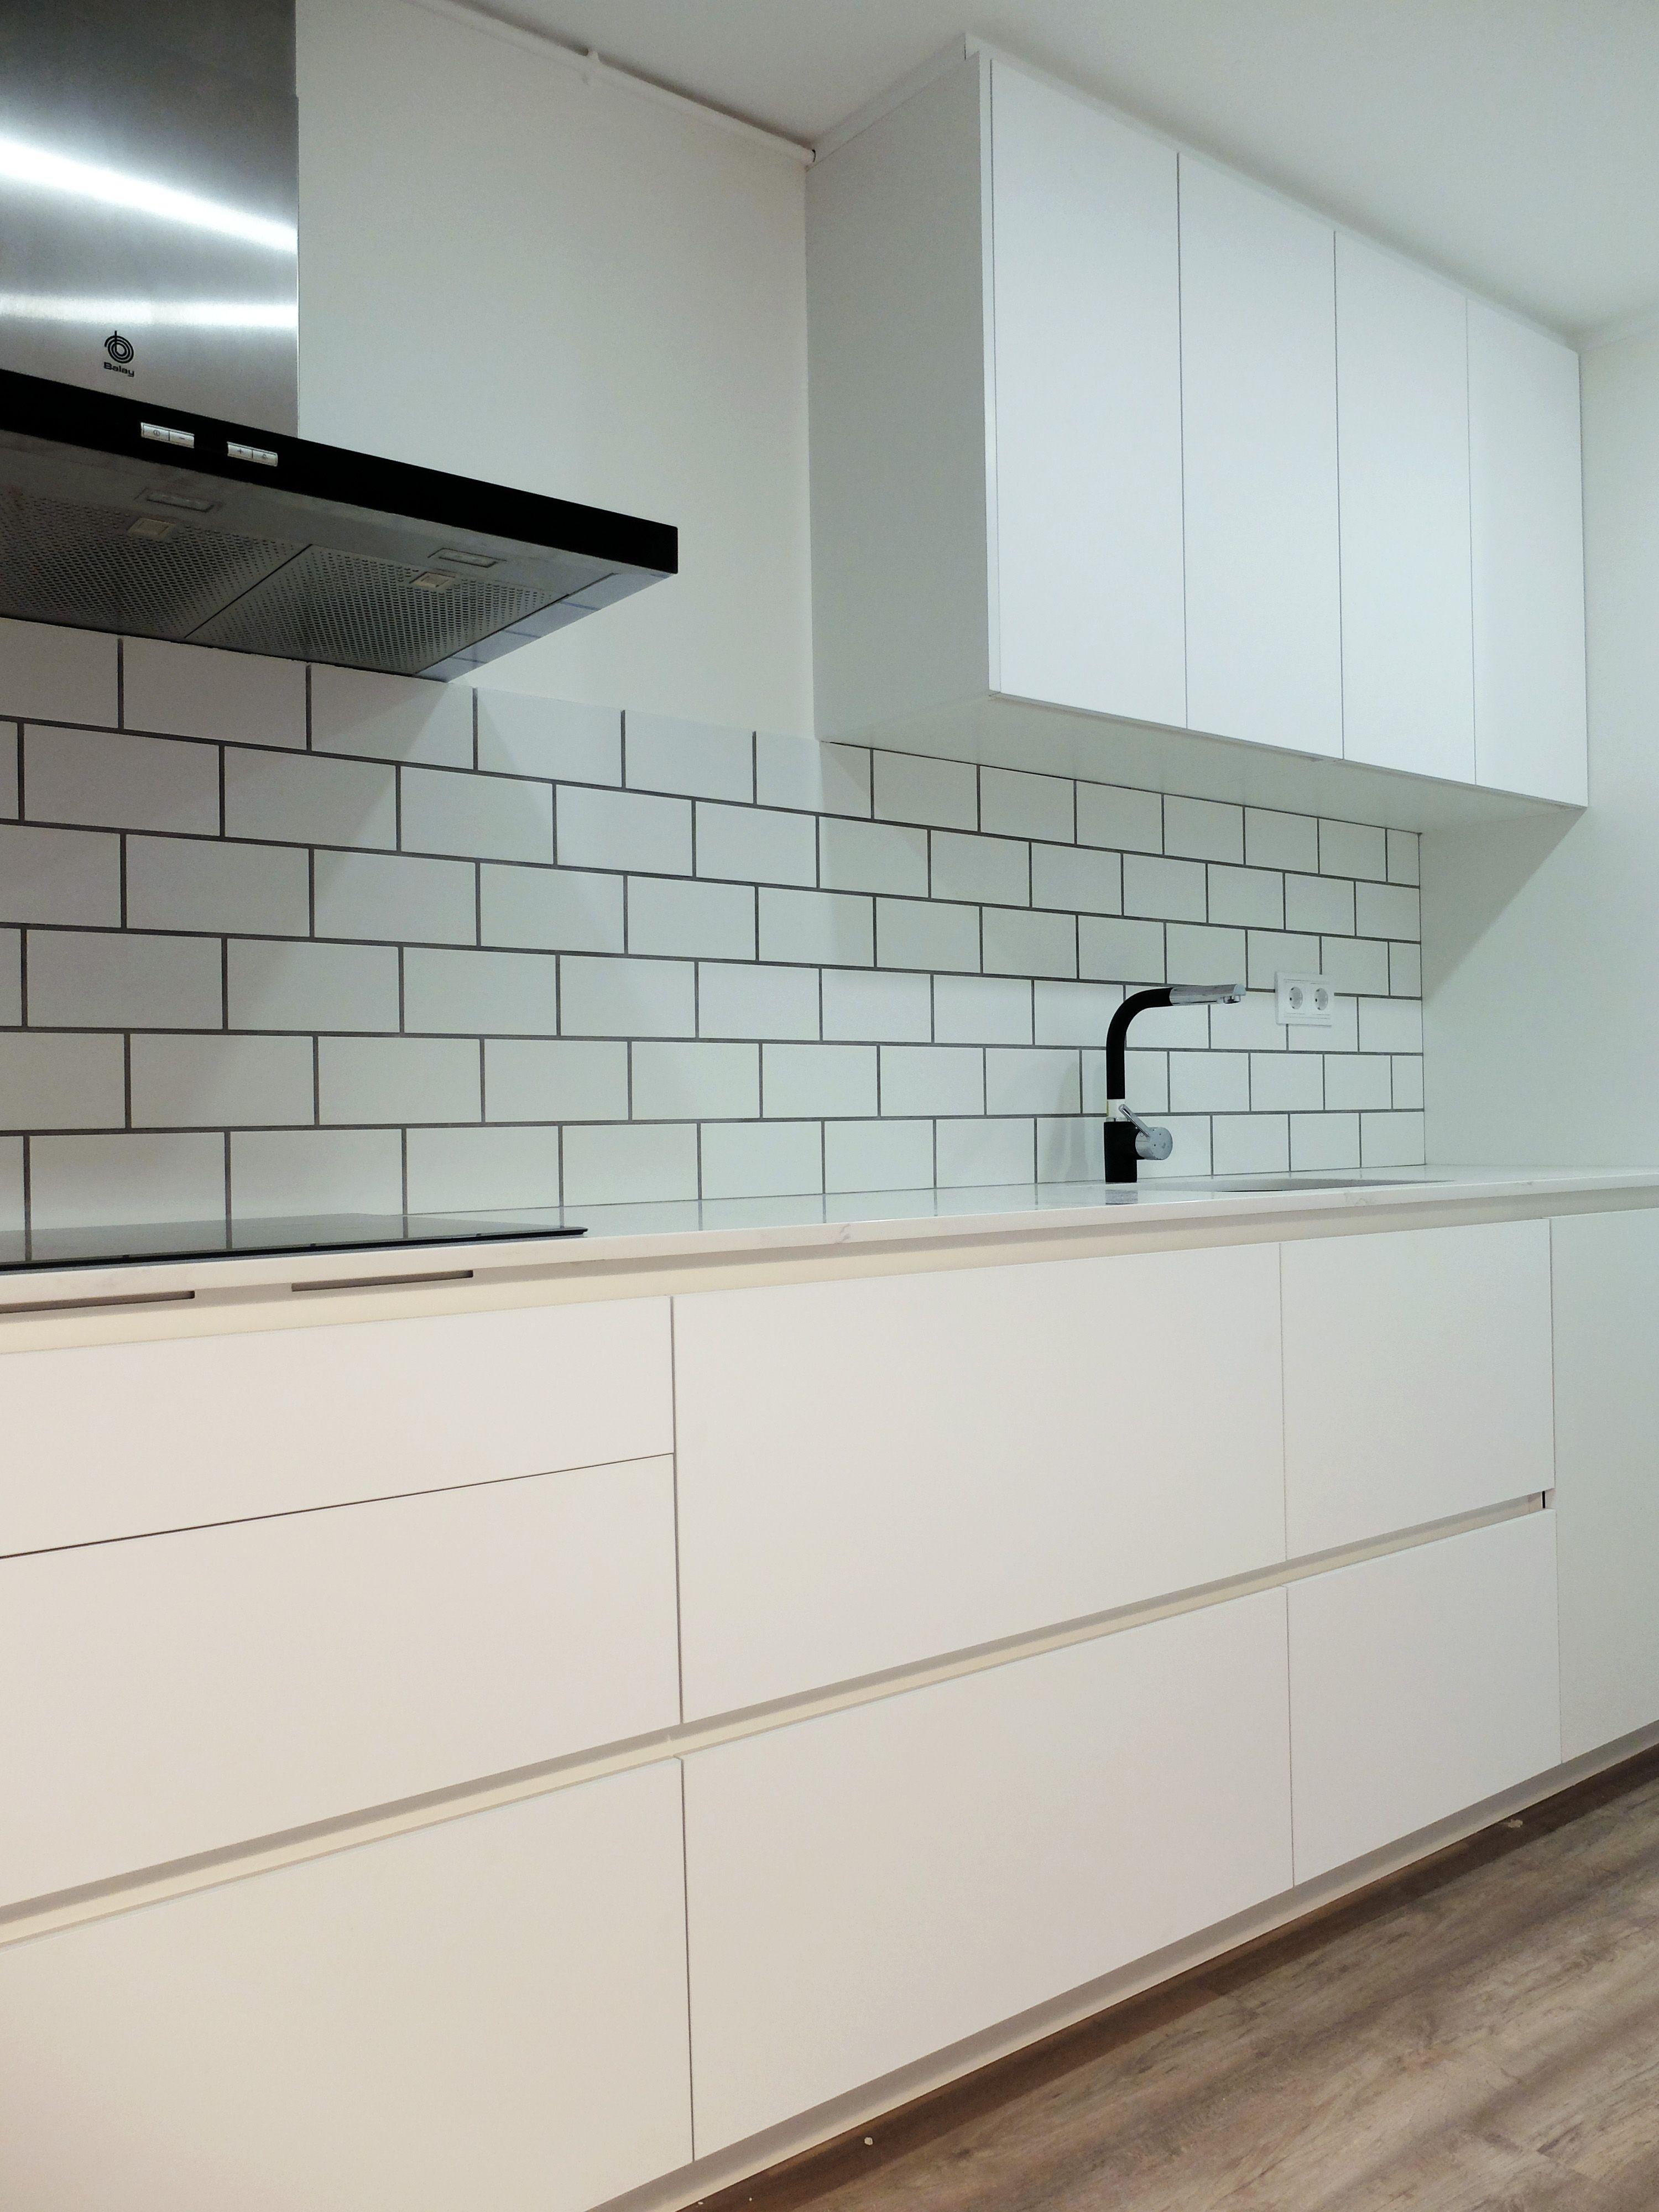 Reforma De Cocina Blanca Con Frontal De Azulejo Rectangular Con